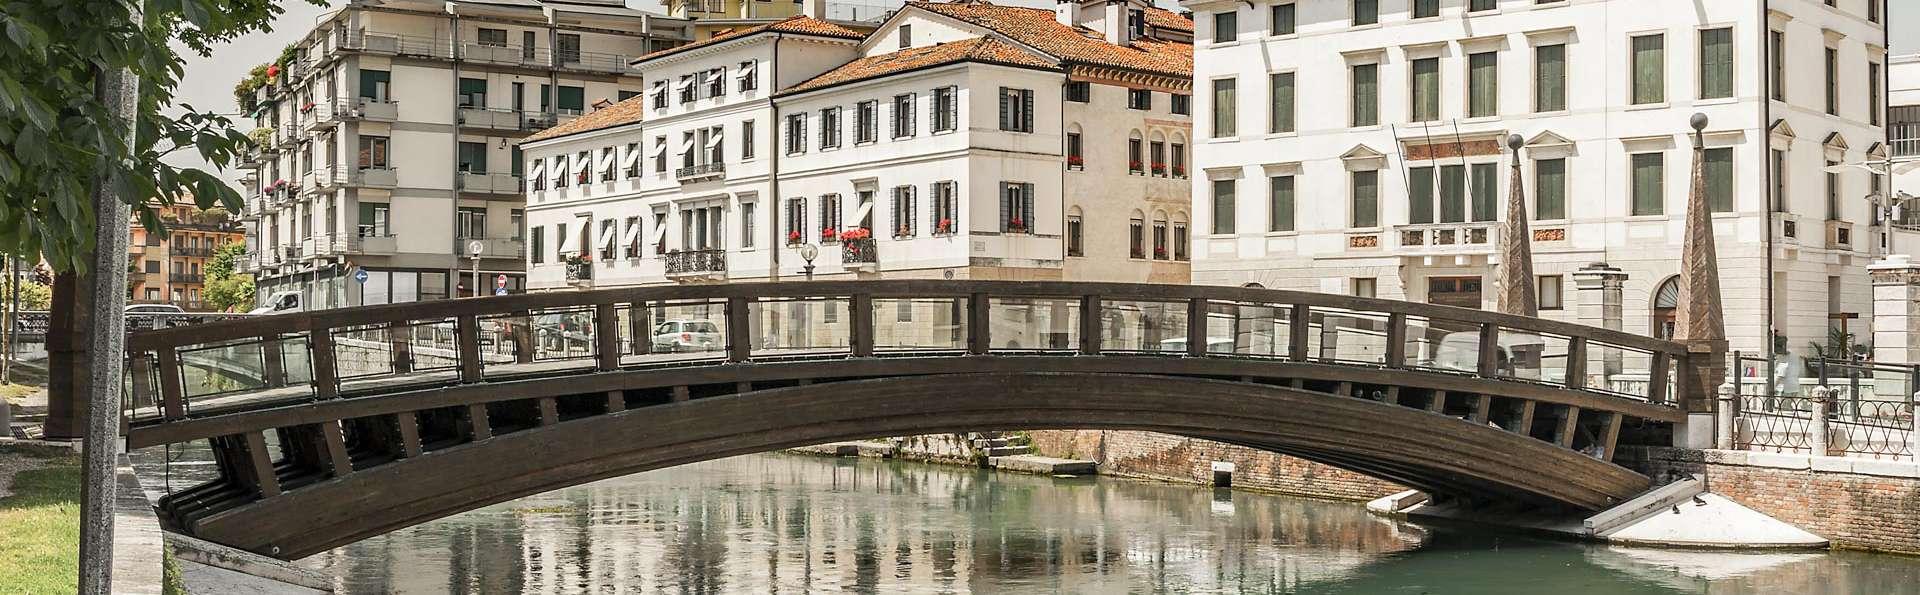 Villa Pace Park Hotel Bolognese - EDIT_TREVISO_01.jpg